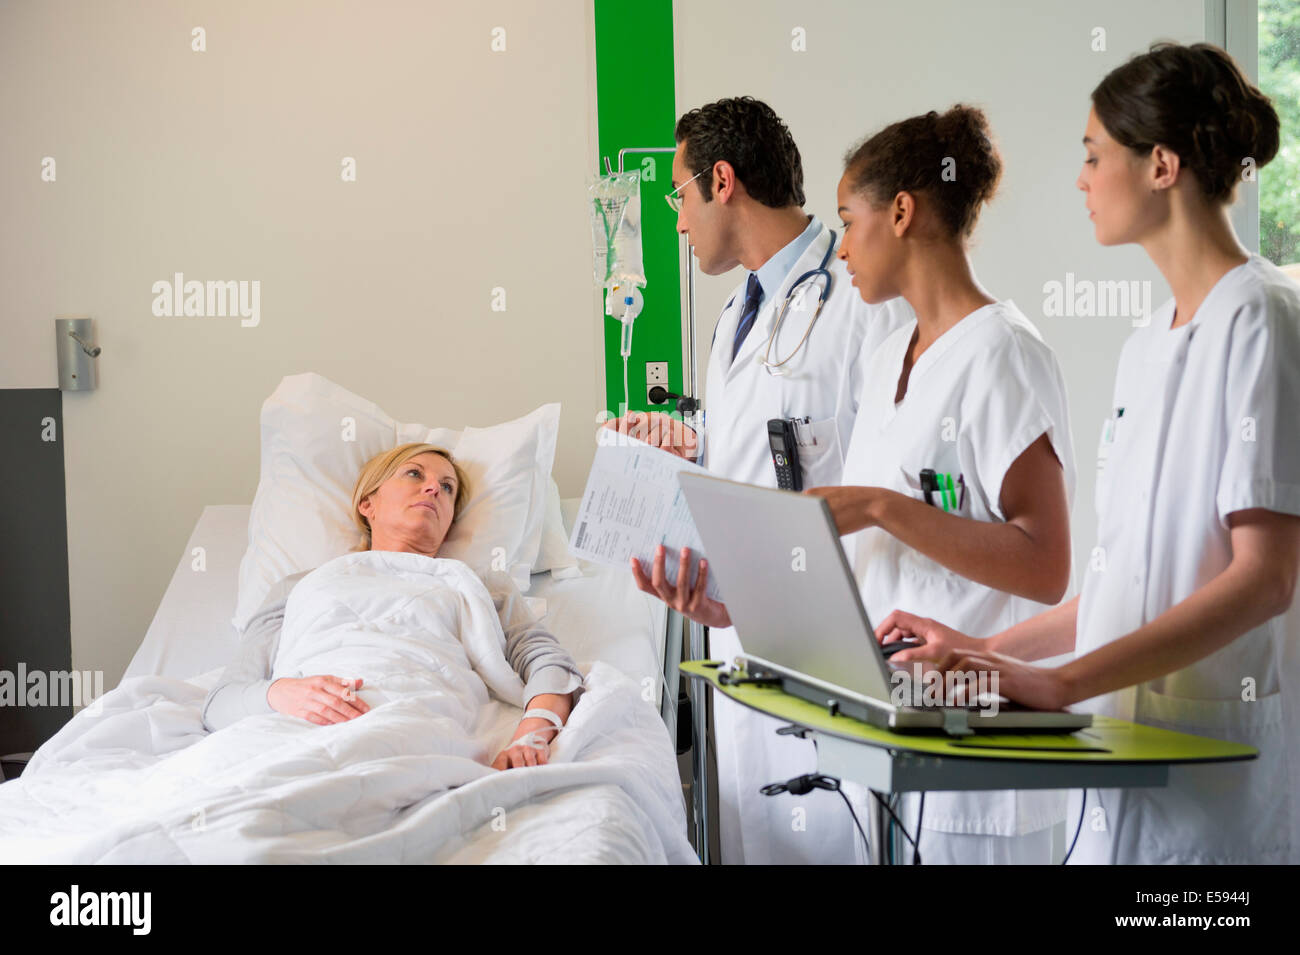 L'équipe médicale discuter femme dossier patient in hospital bed Photo Stock